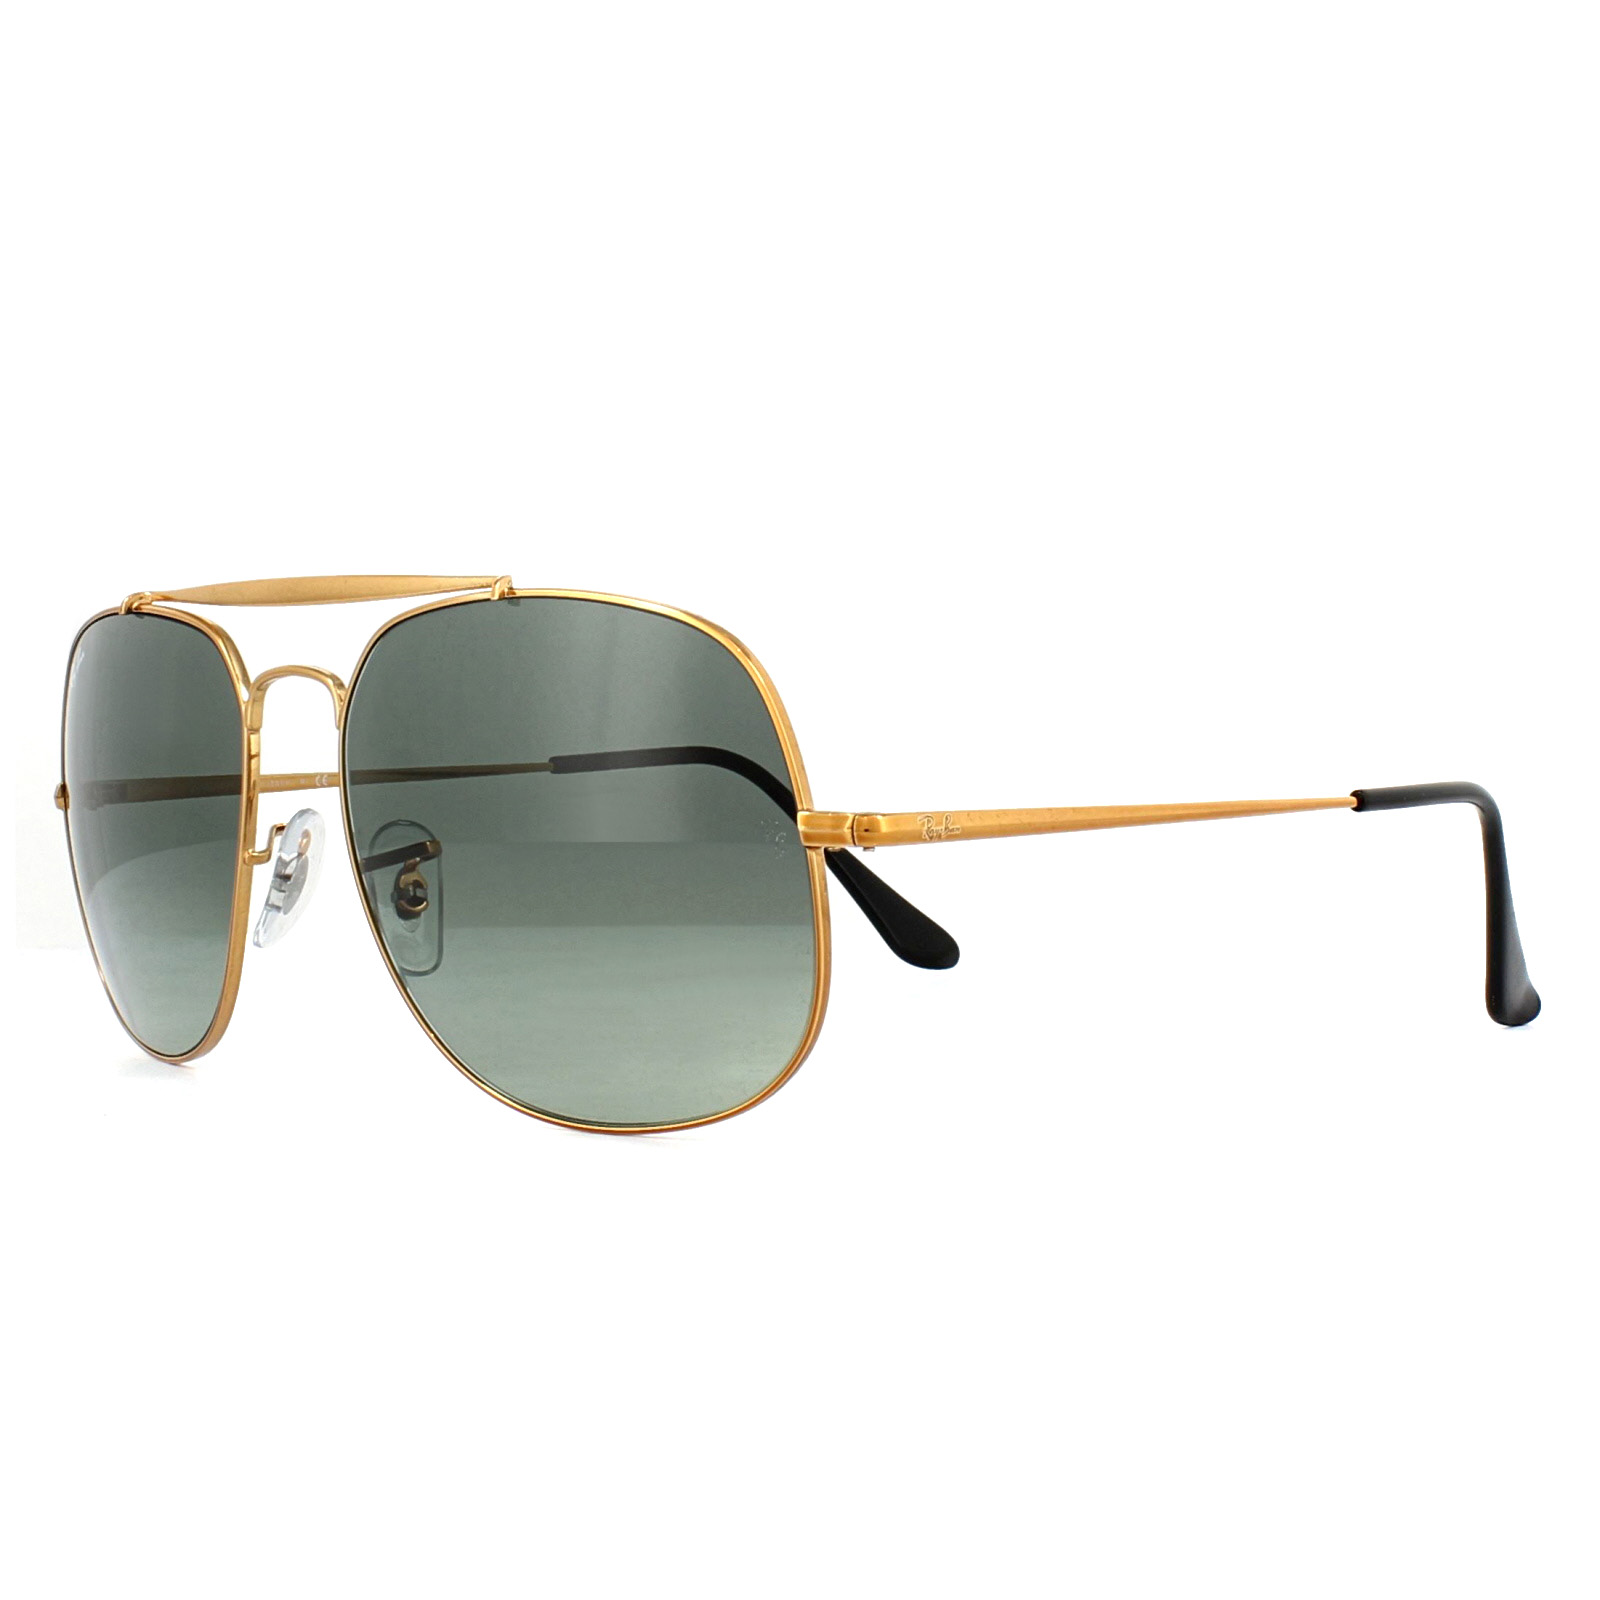 3bde3786a80 Sentinel Ray-Ban Sunglasses General 3561 197 71 Bronze Copper Grey Gradient